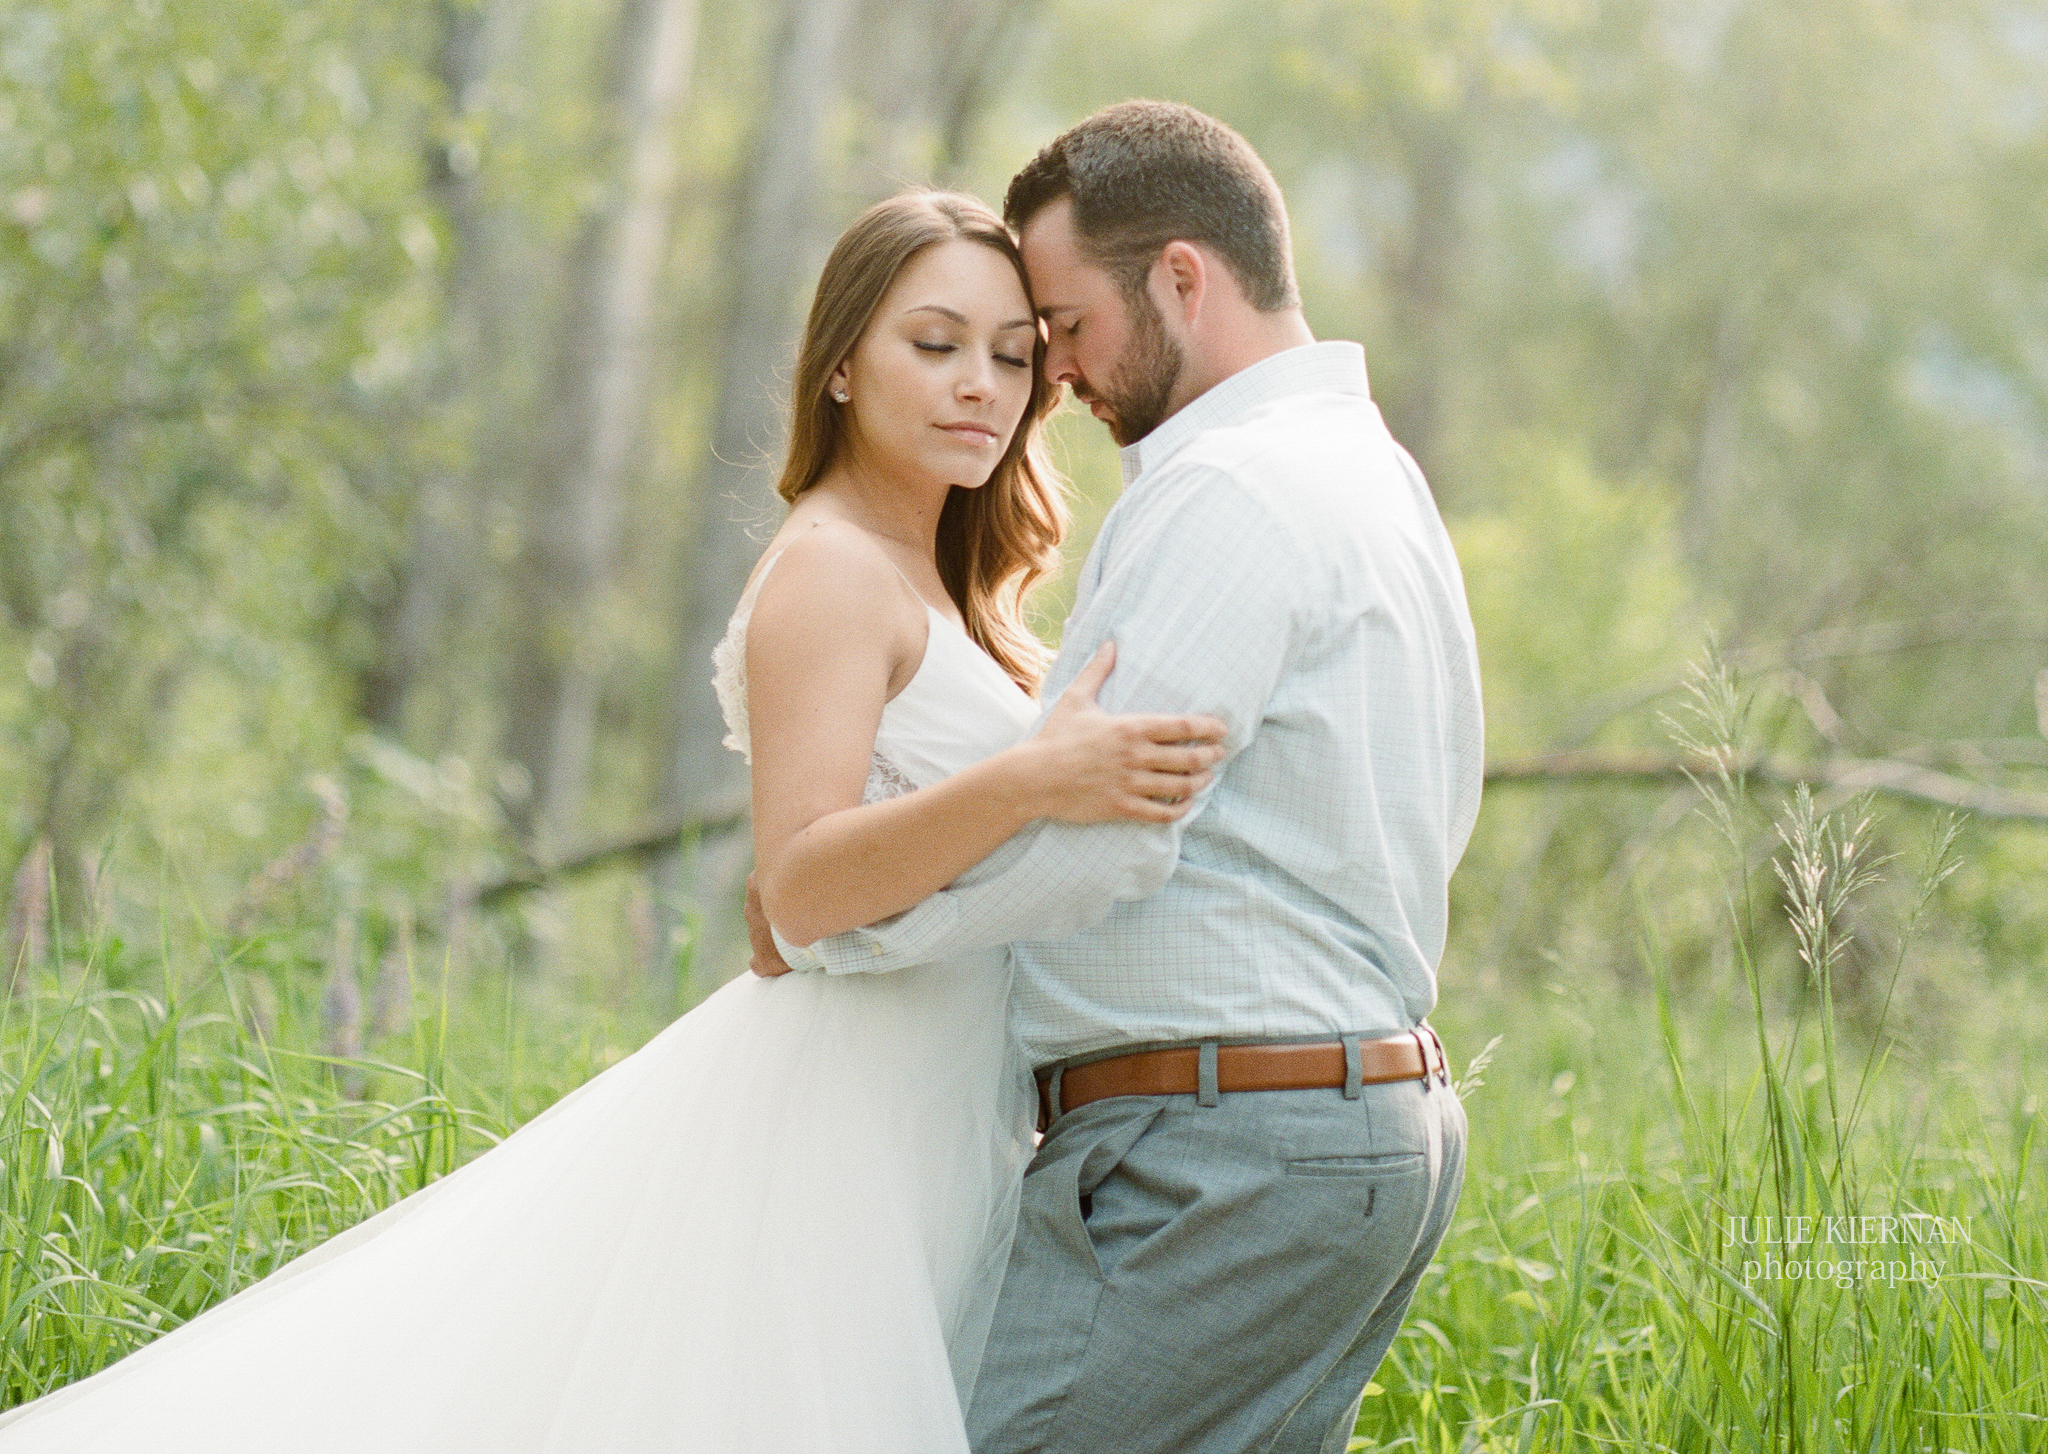 portfolio-Wedding-film-p645n-2048-72-SS-2.jpg